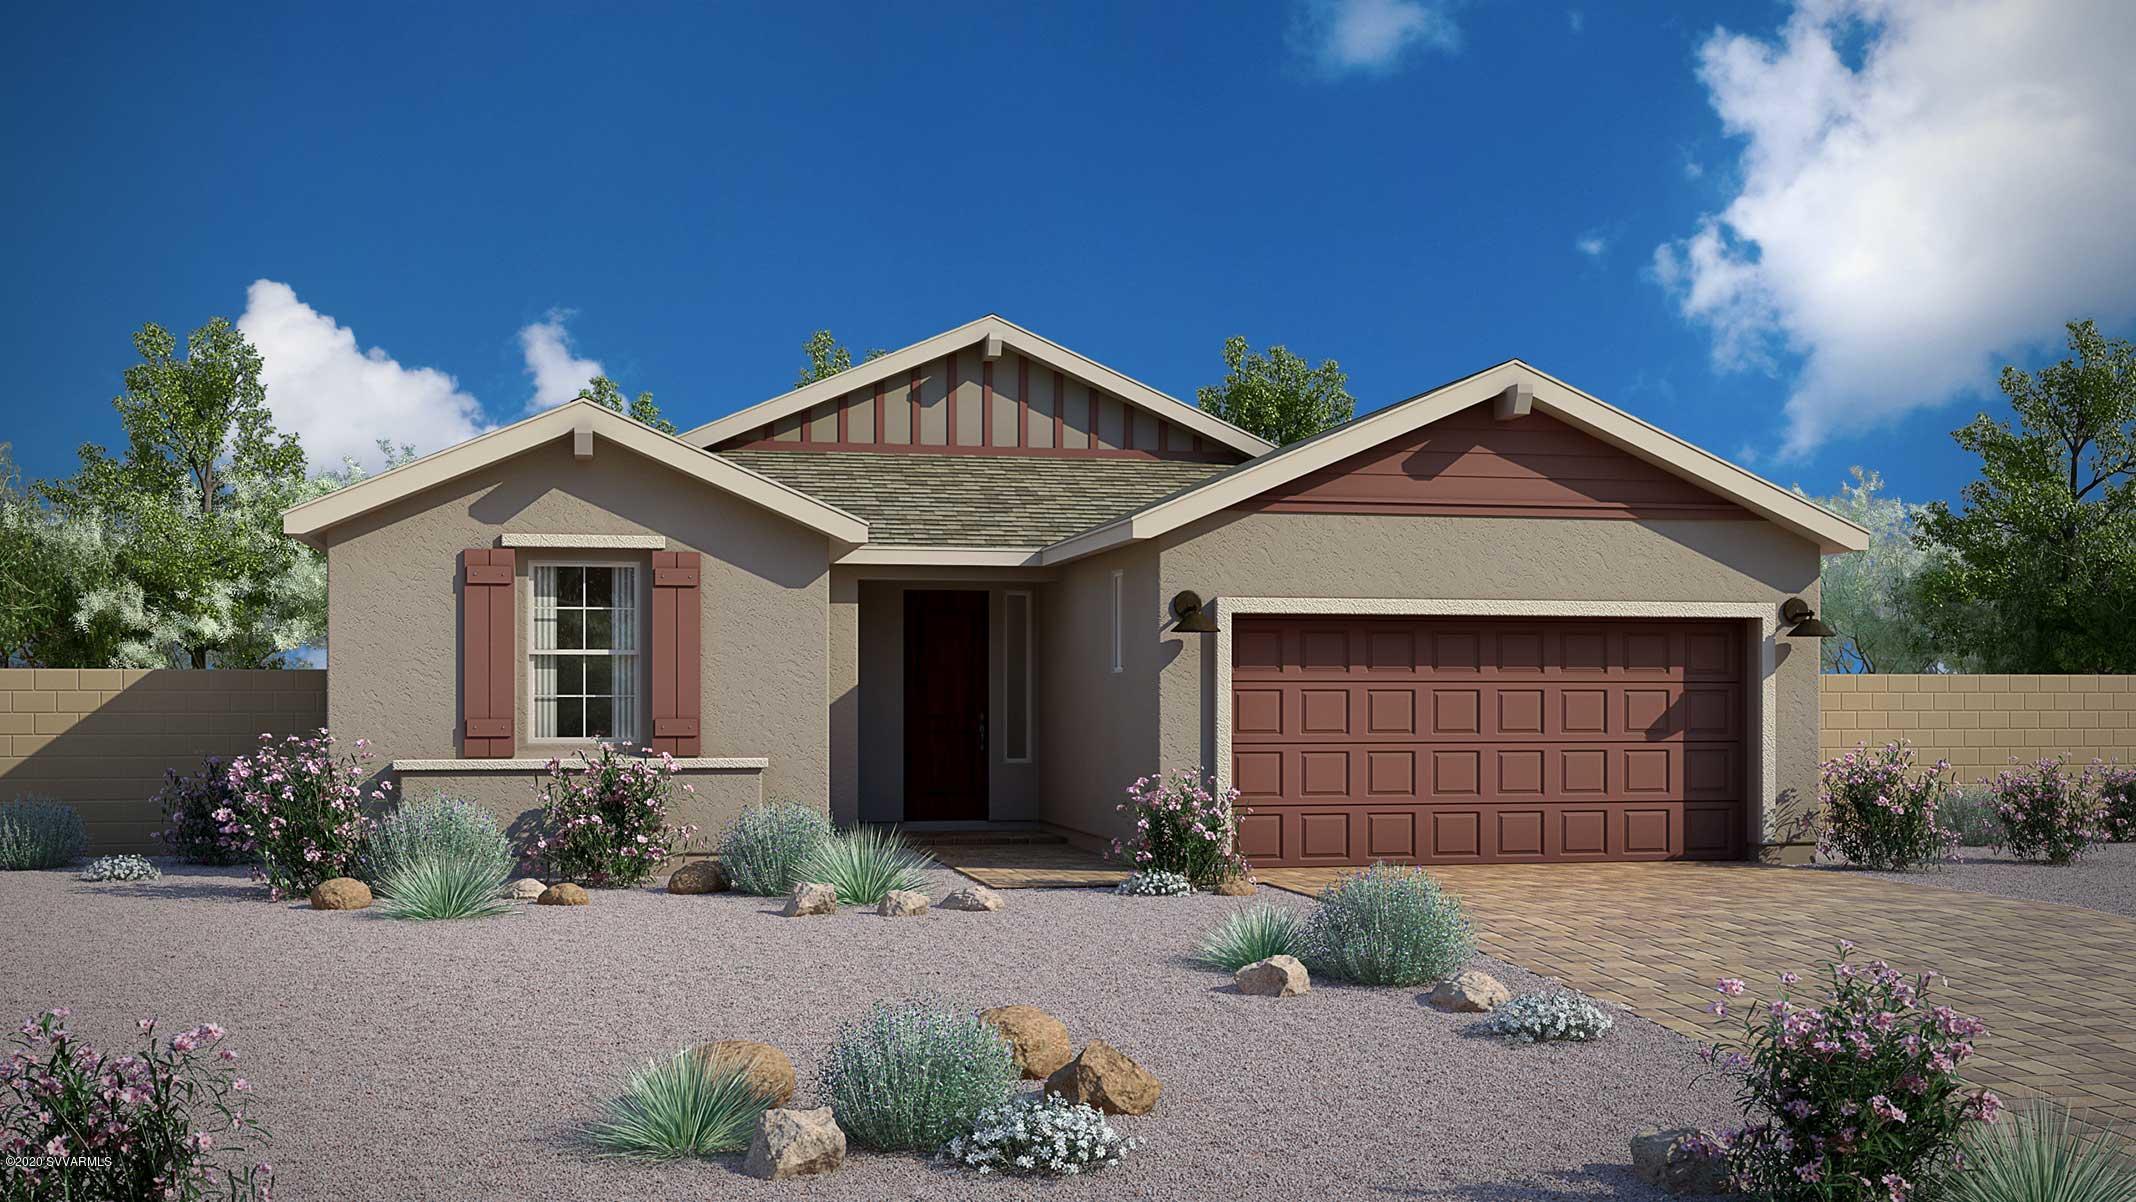 471 Cleopatra Hill Rd Clarkdale, AZ 86324